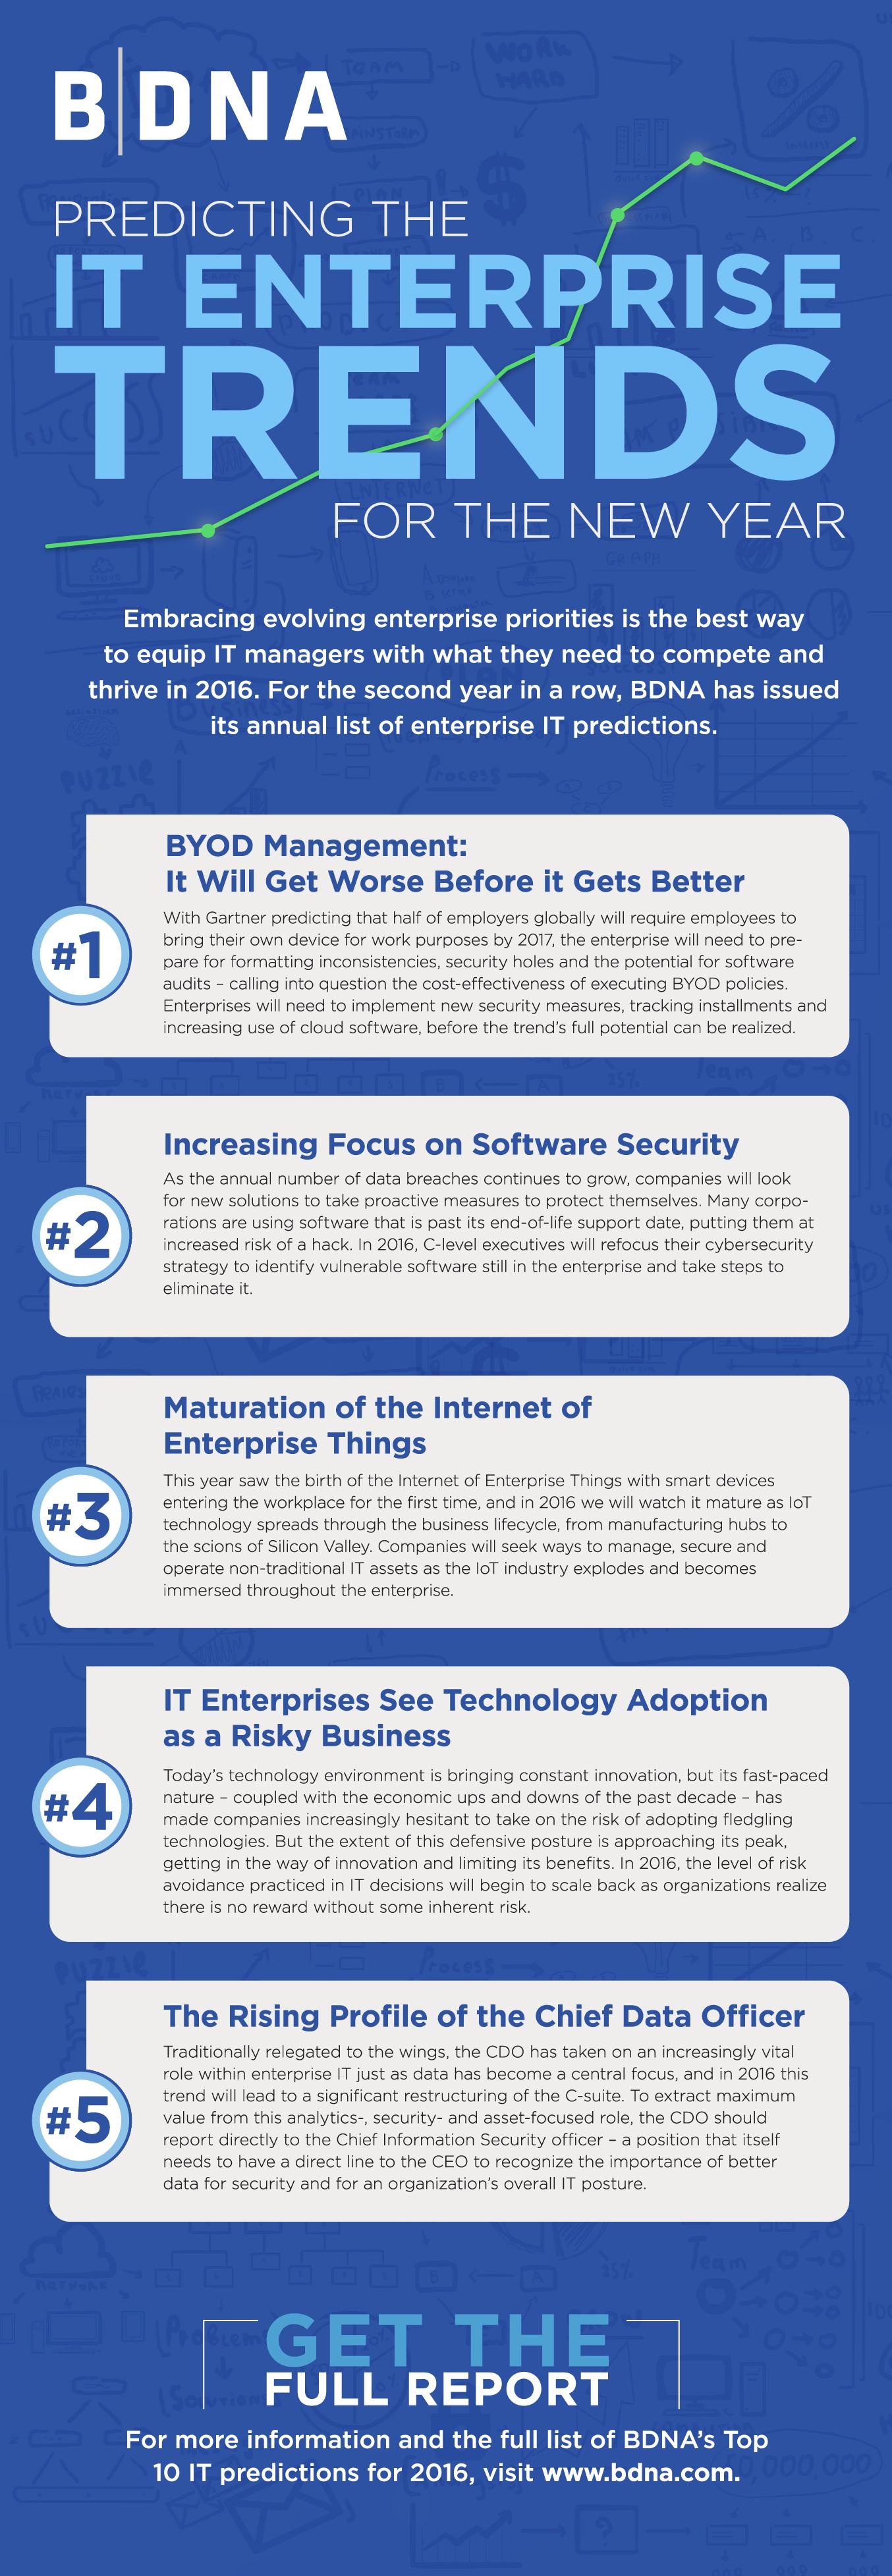 BDNA-Predicting-IT Enterprise-Trends16